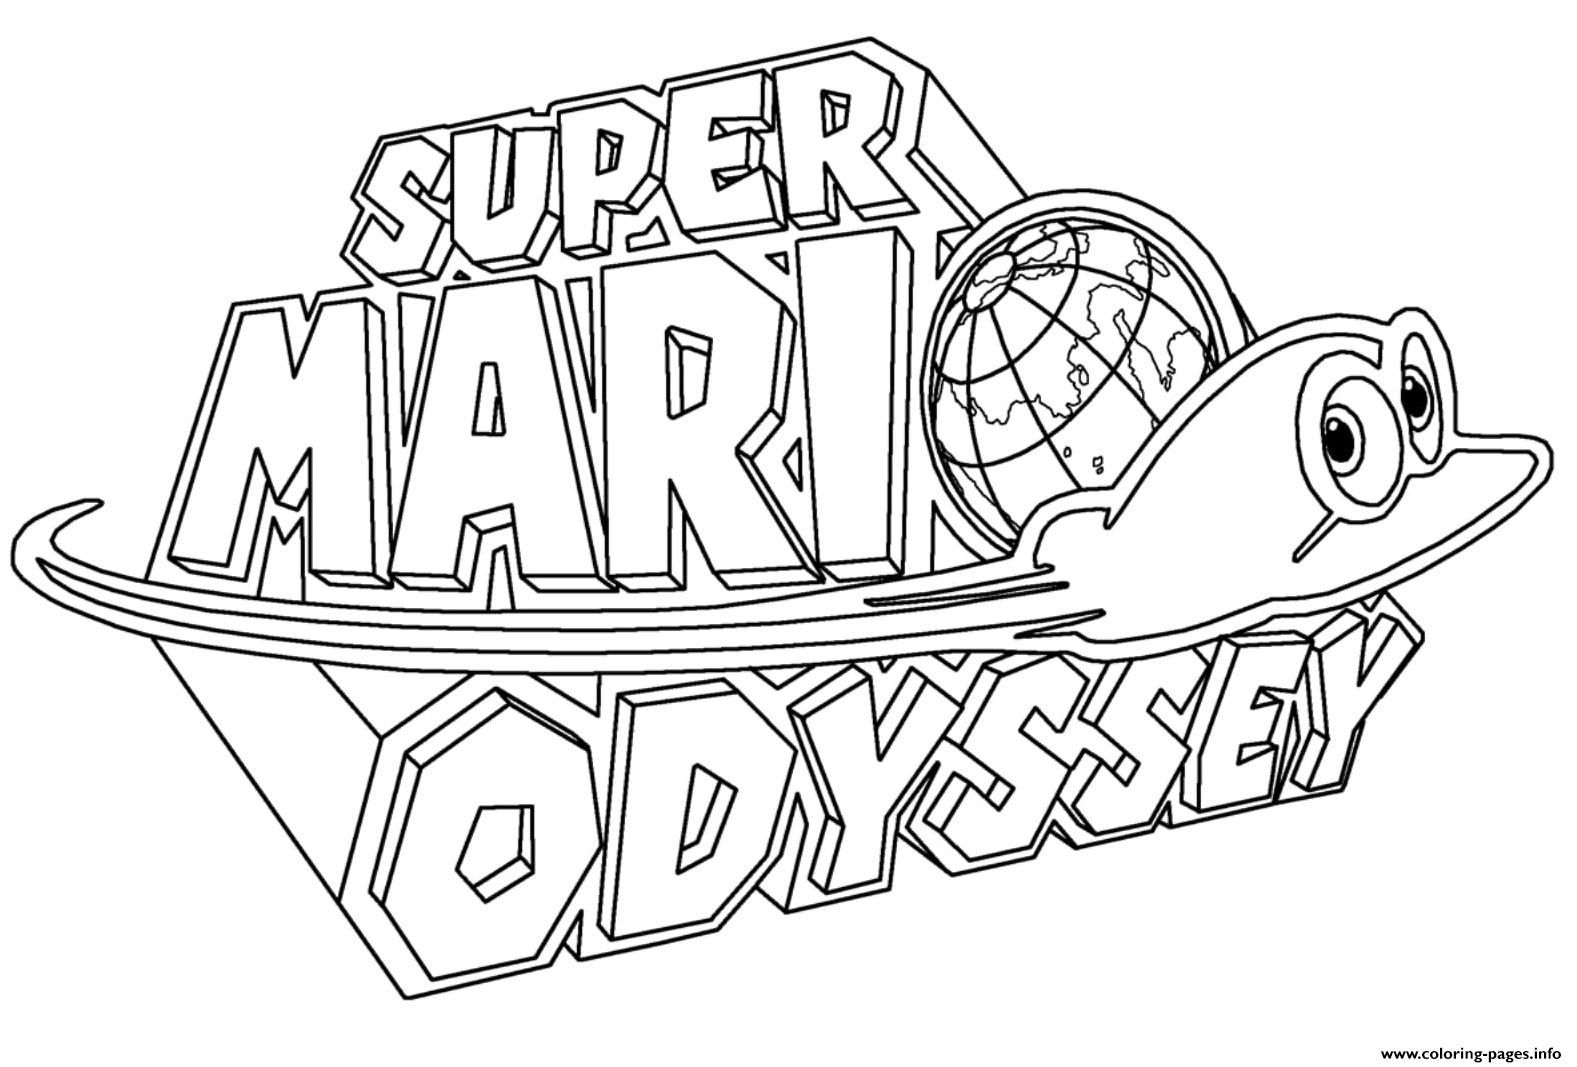 Print Super Mario Odyssey Logo Nintendo Coloring Pages Coloring Pages Super Mario Coloring Pages Mario Coloring Pages